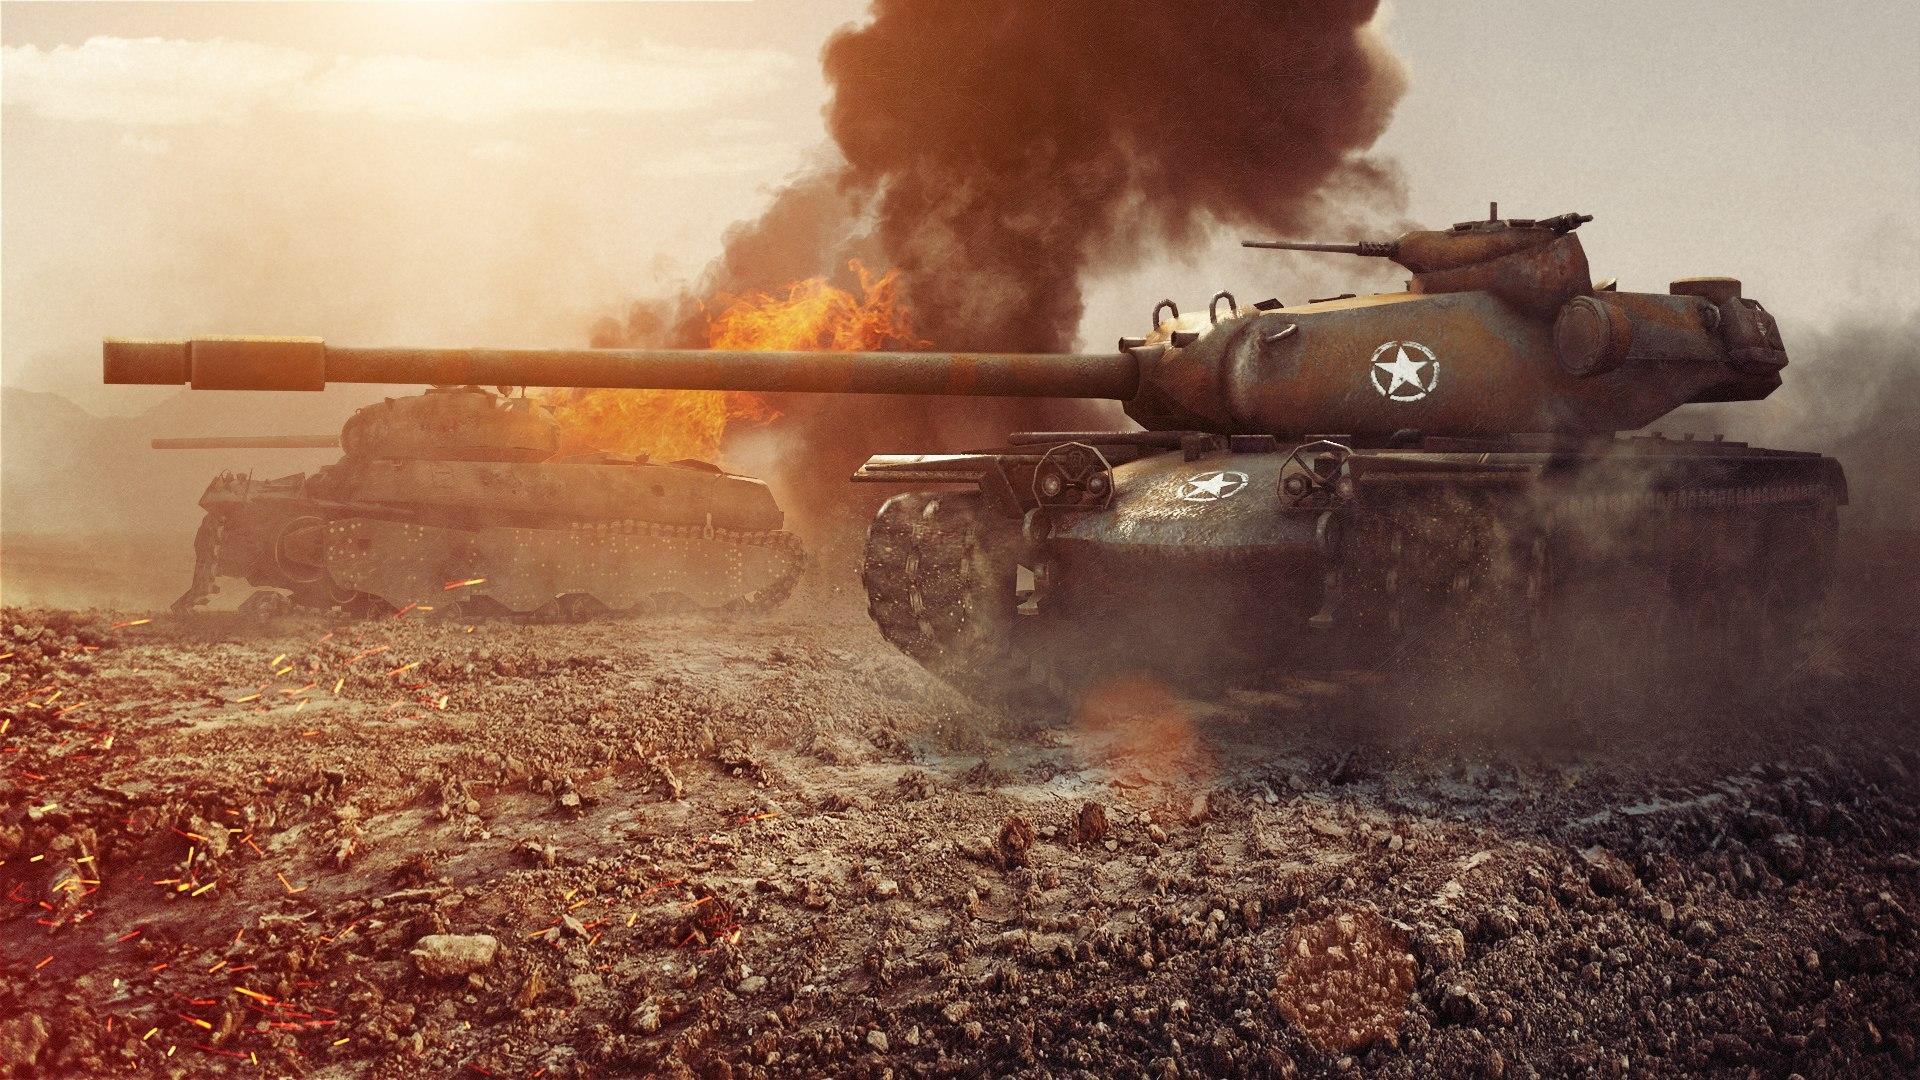 44+ World of Tanks Wallpaper 1920X1080 on WallpaperSafari